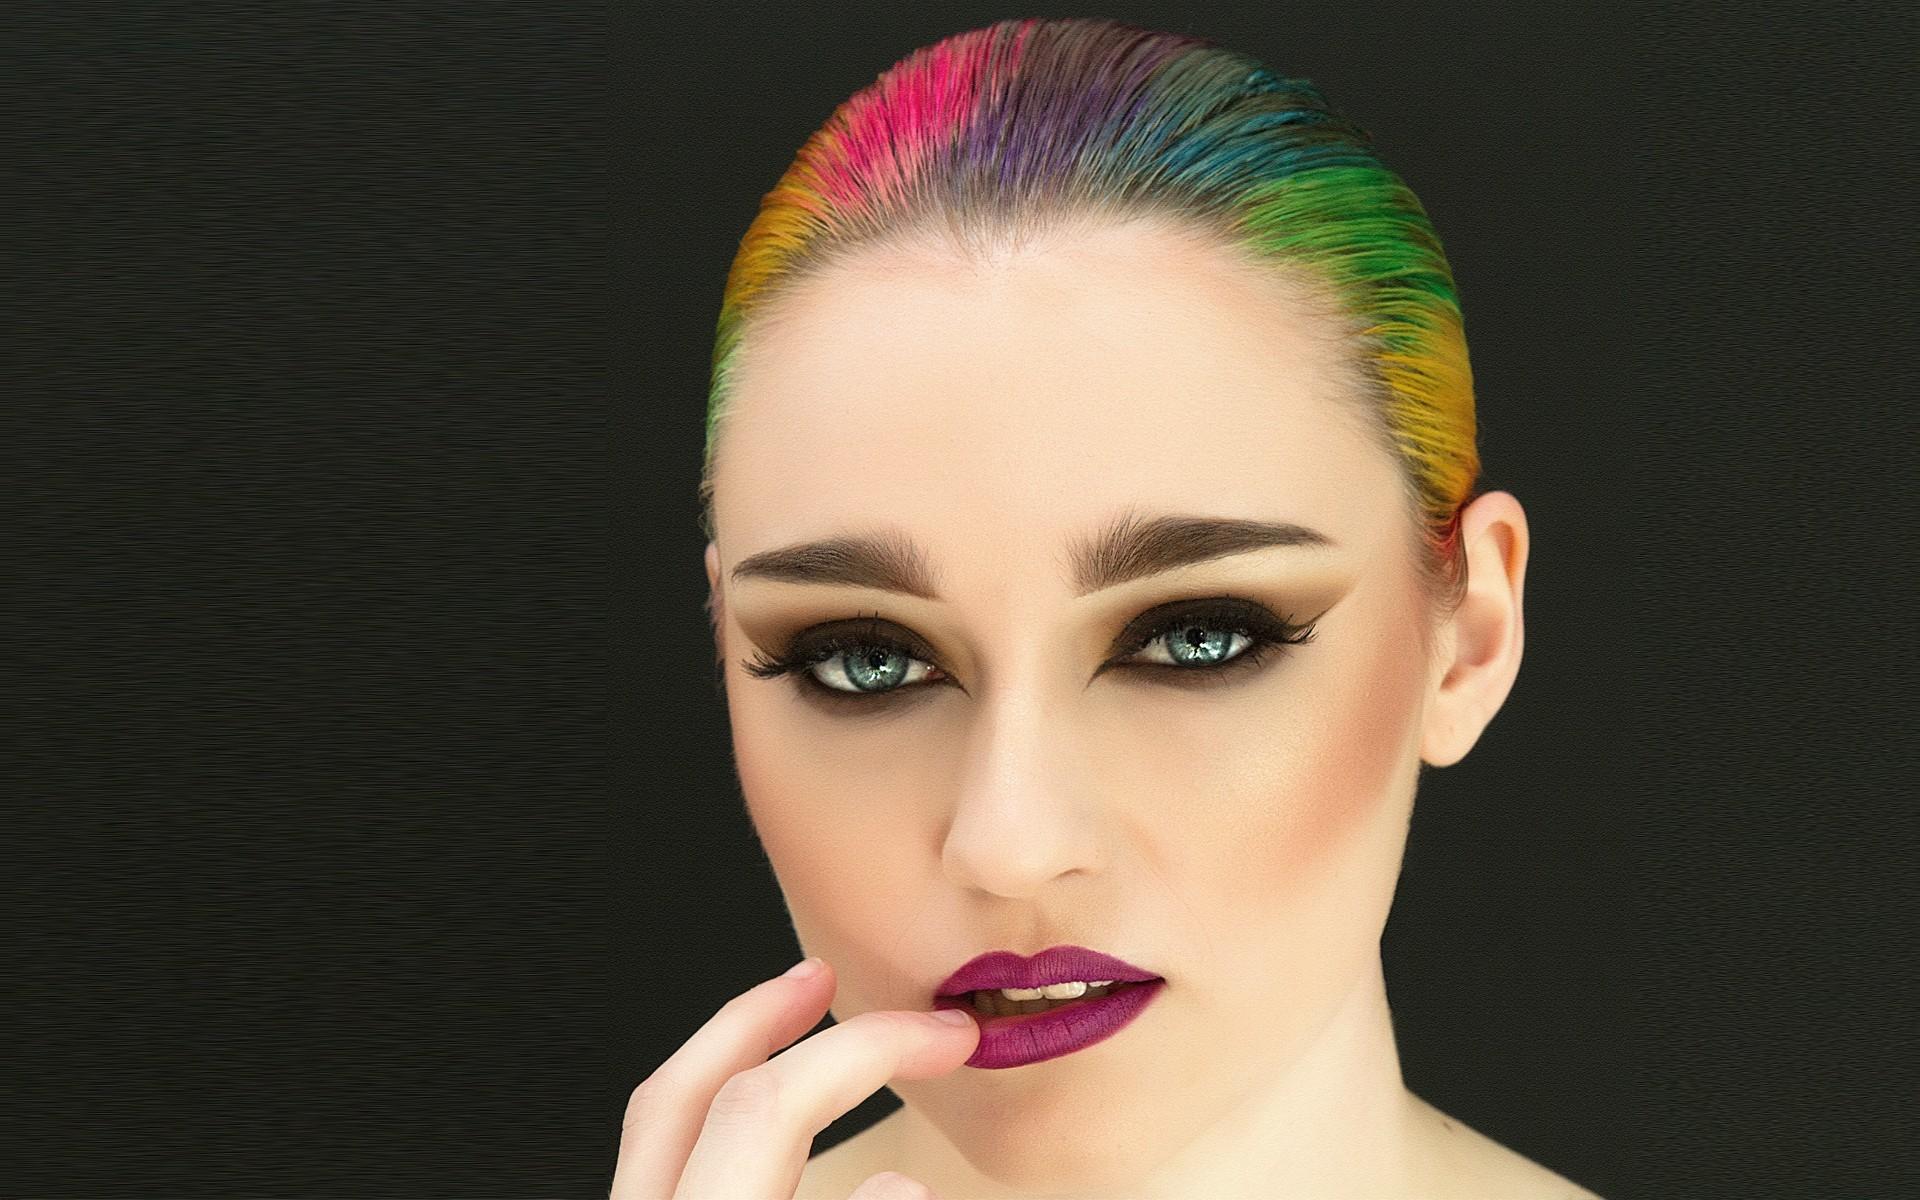 Fashion Girl Make-Up & Hair Stylist